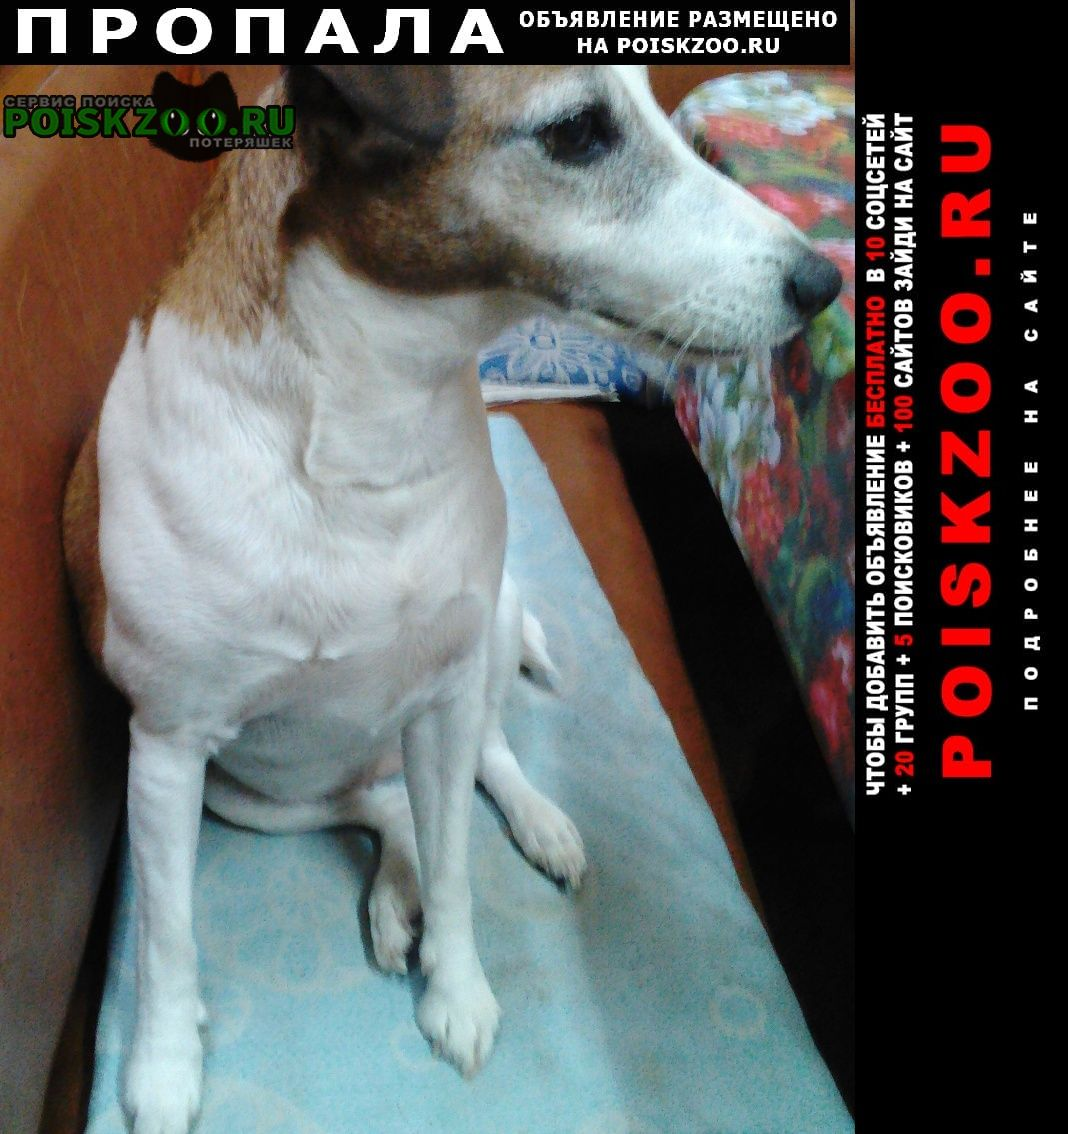 Пропала собака потерялась фокстерьер Белгород